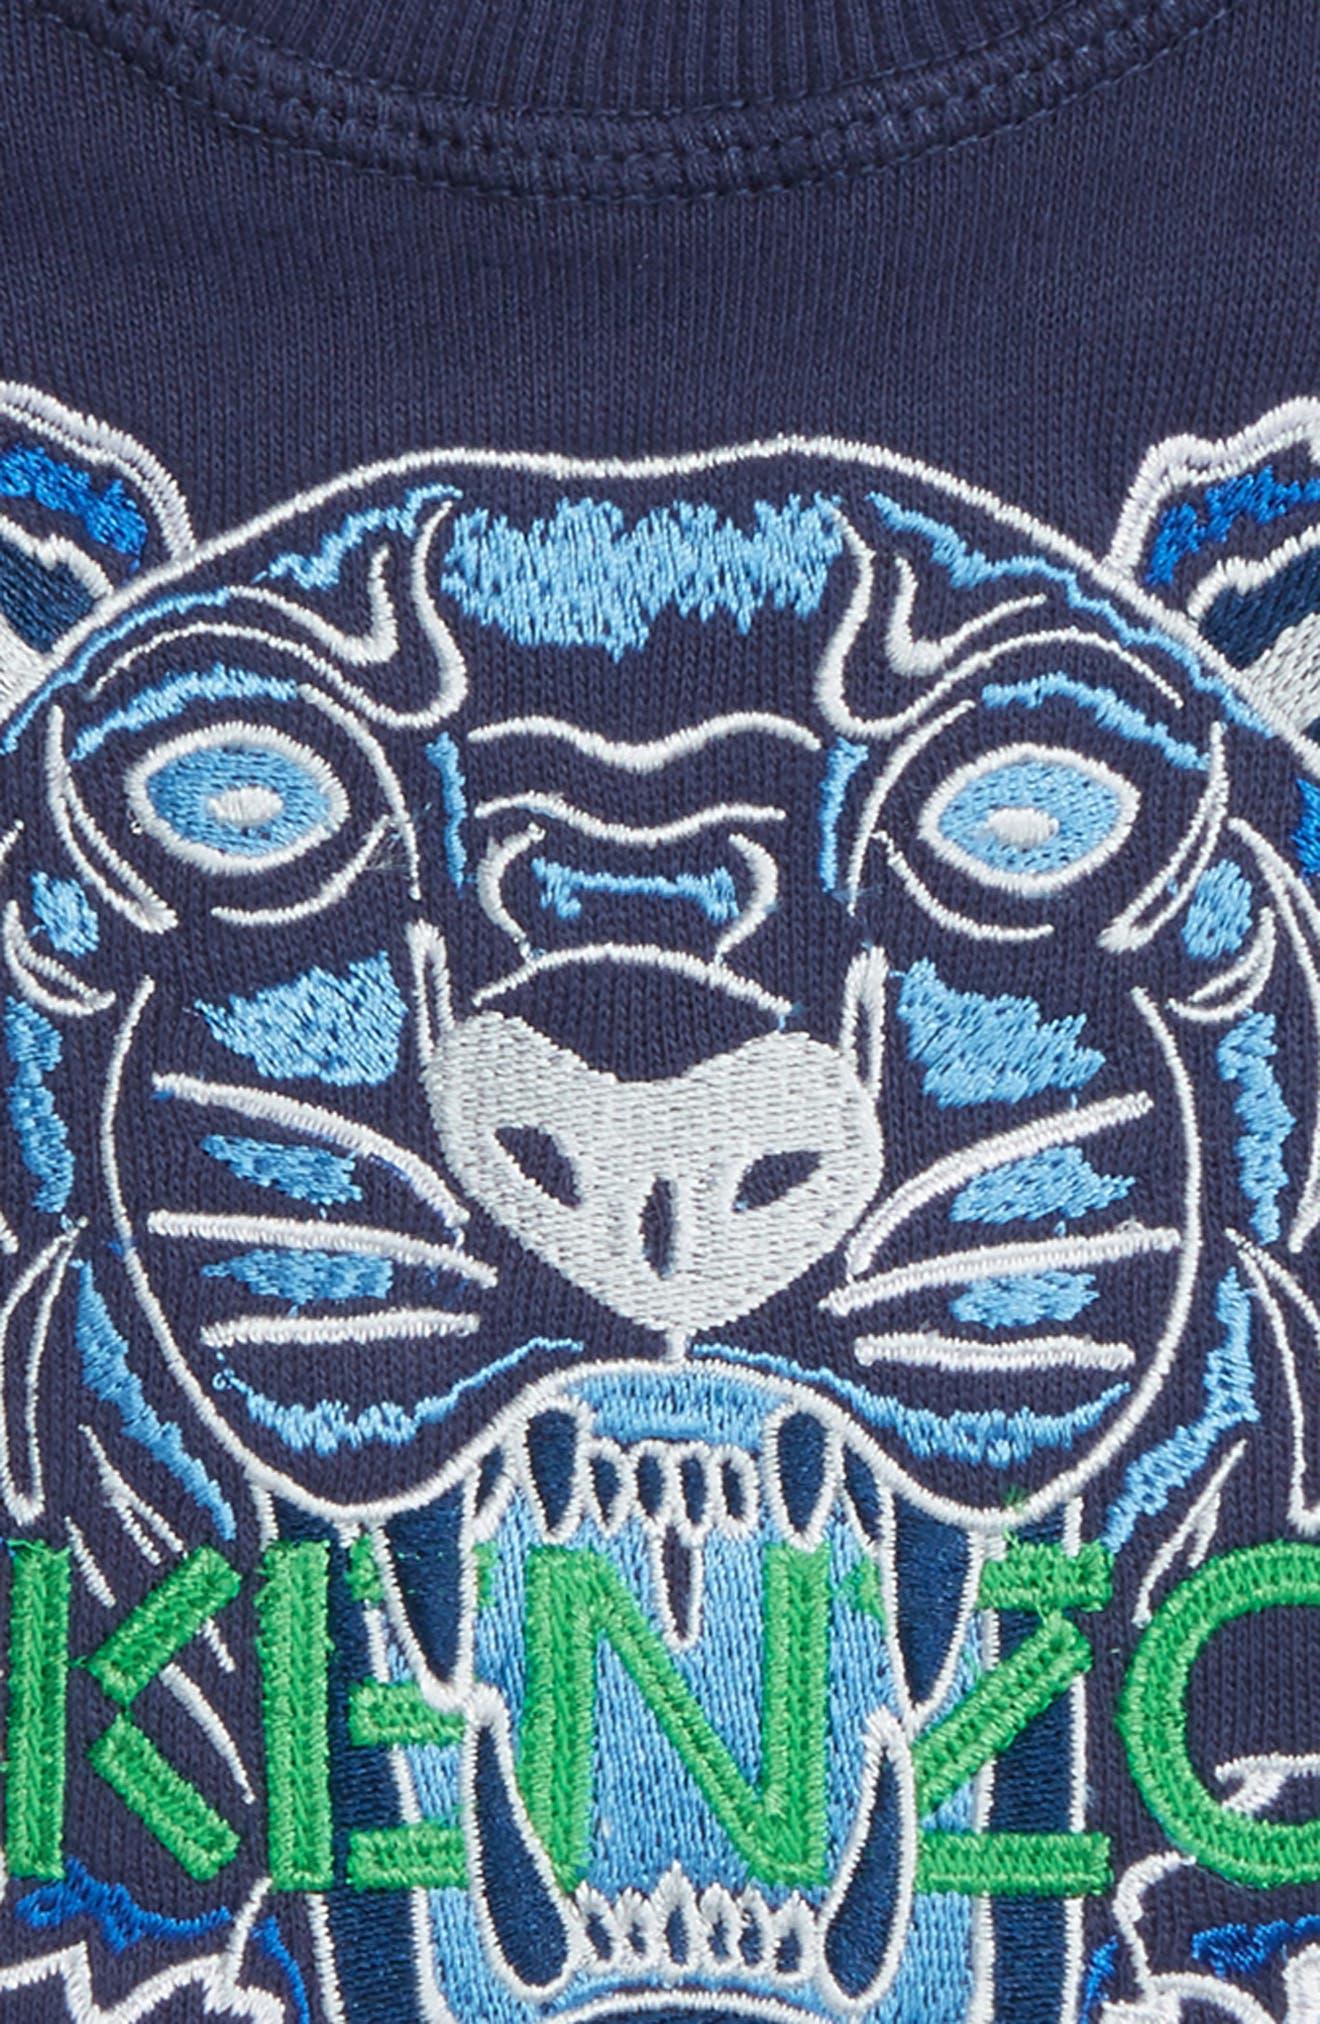 Embroidered Tiger Logo Sweatshirt,                             Alternate thumbnail 2, color,                             467